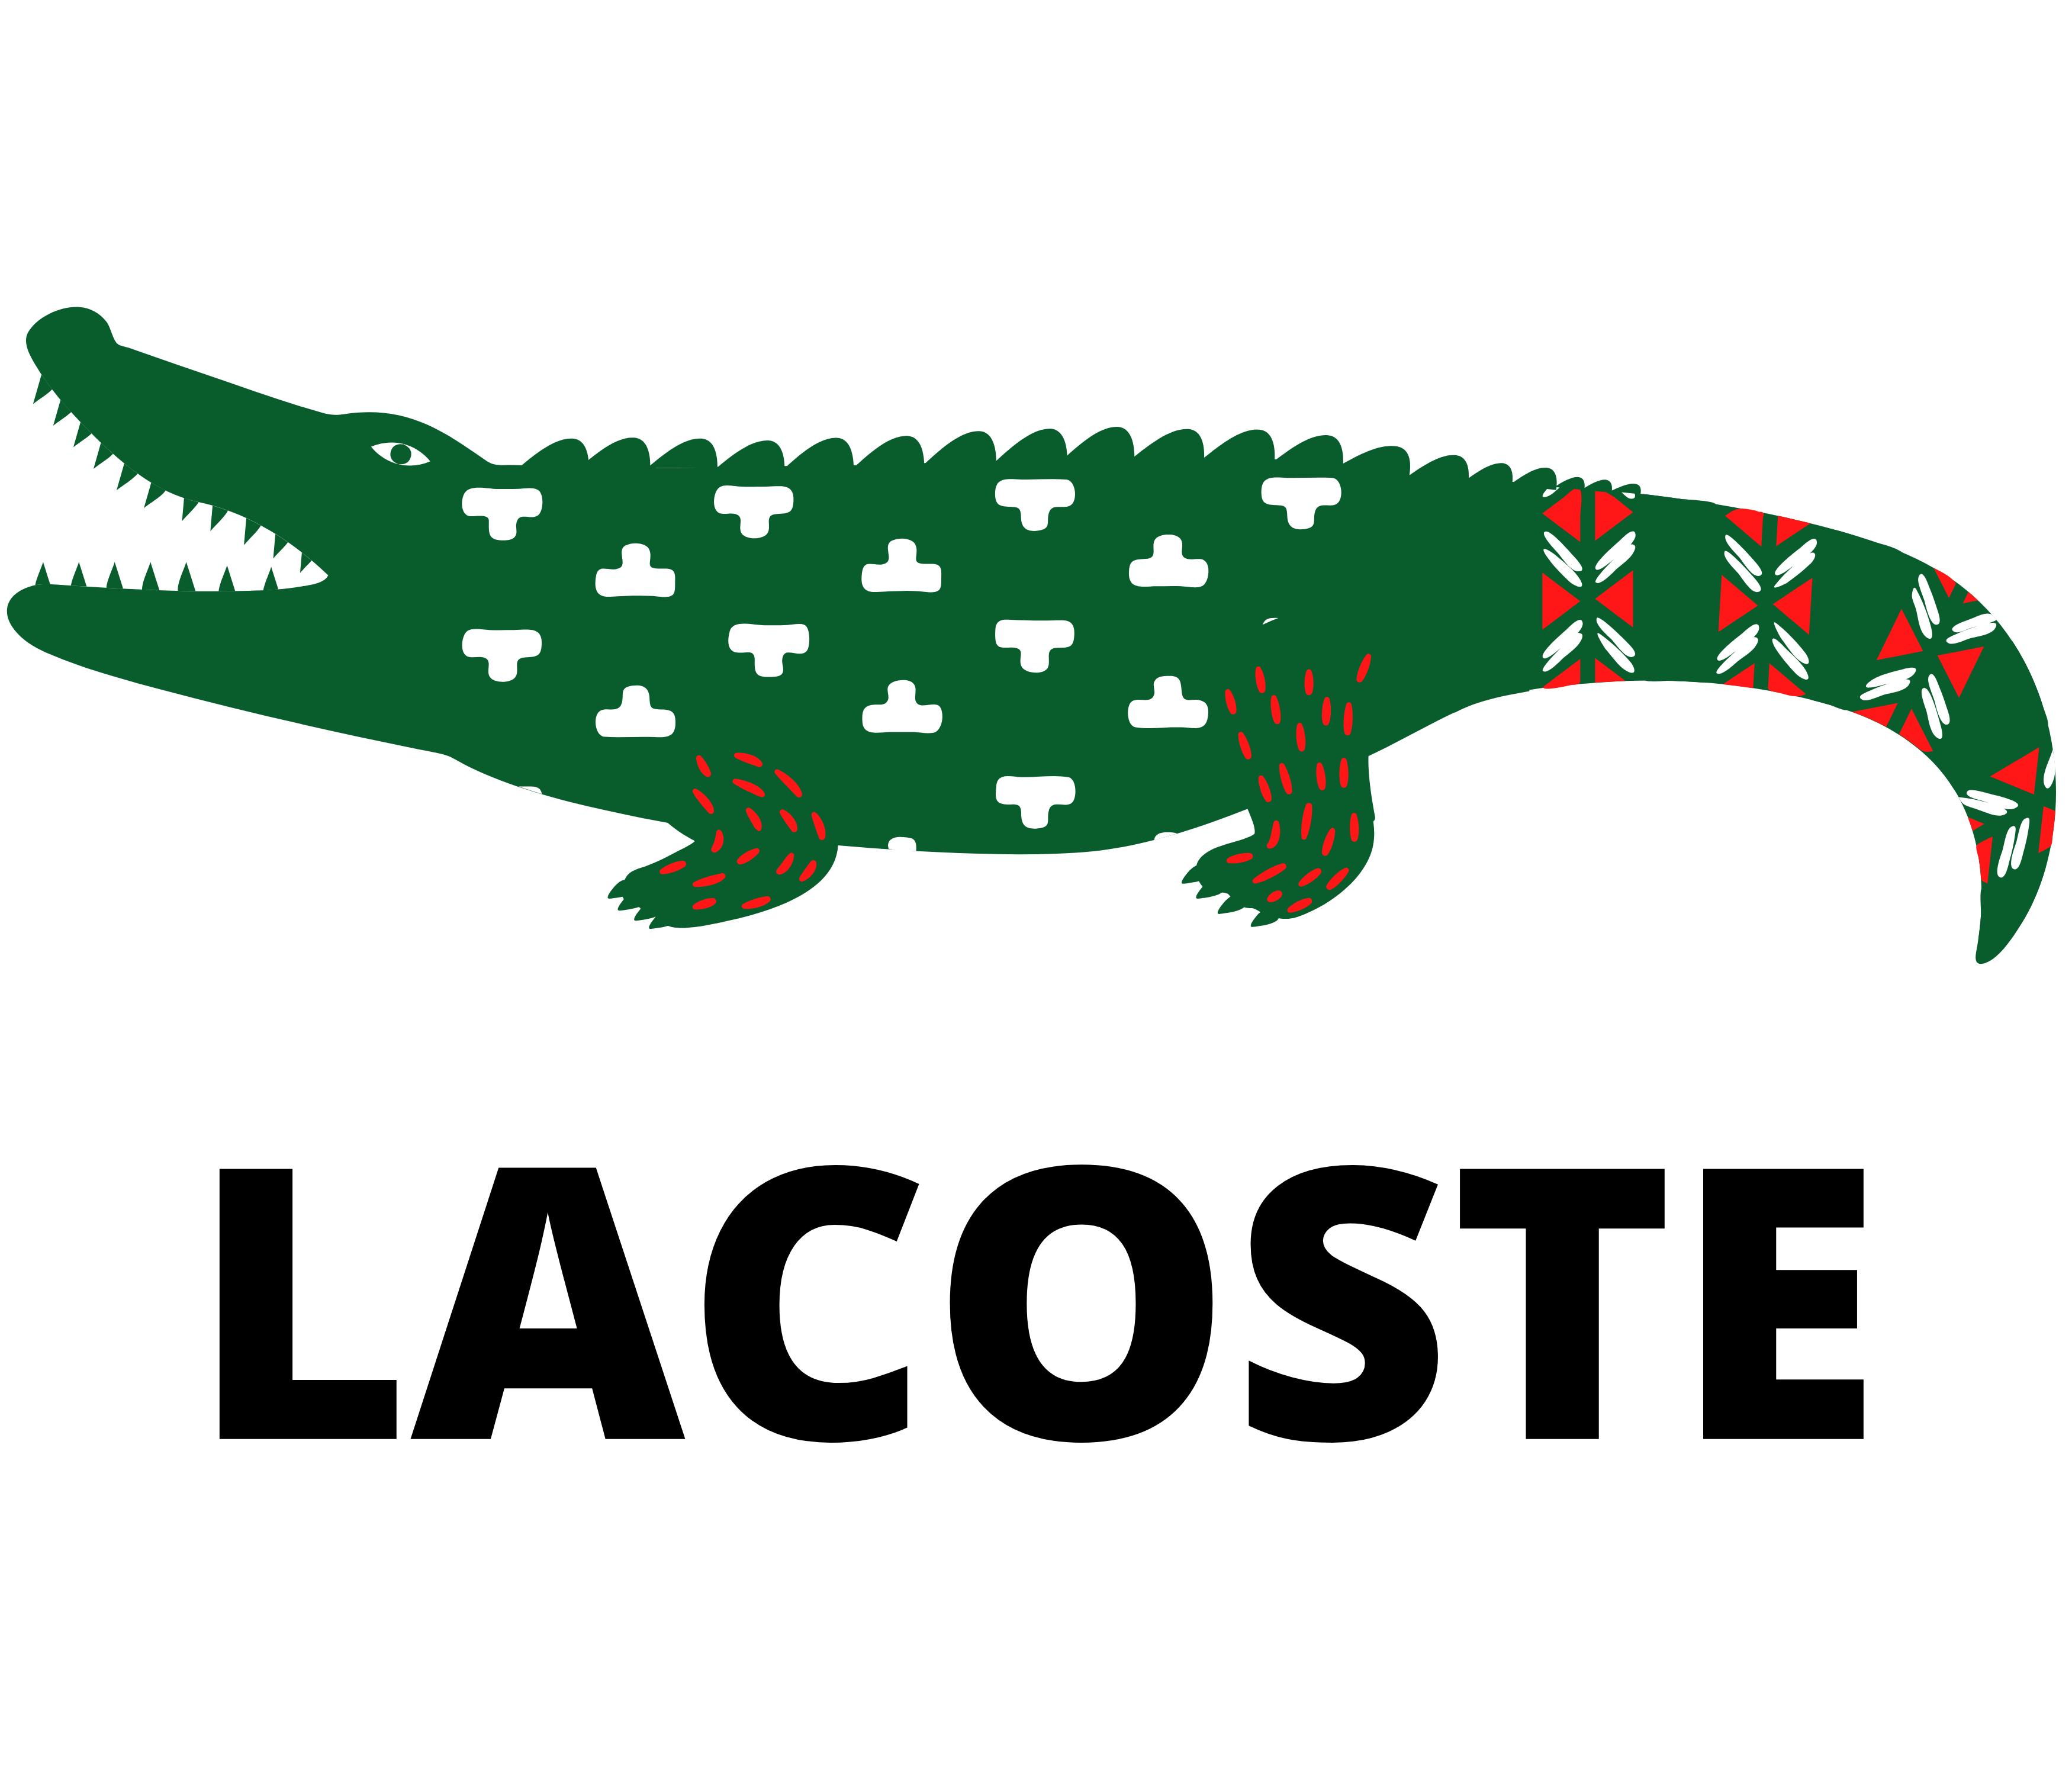 Lacoste In 2020 Lacoste Logo Design Logos